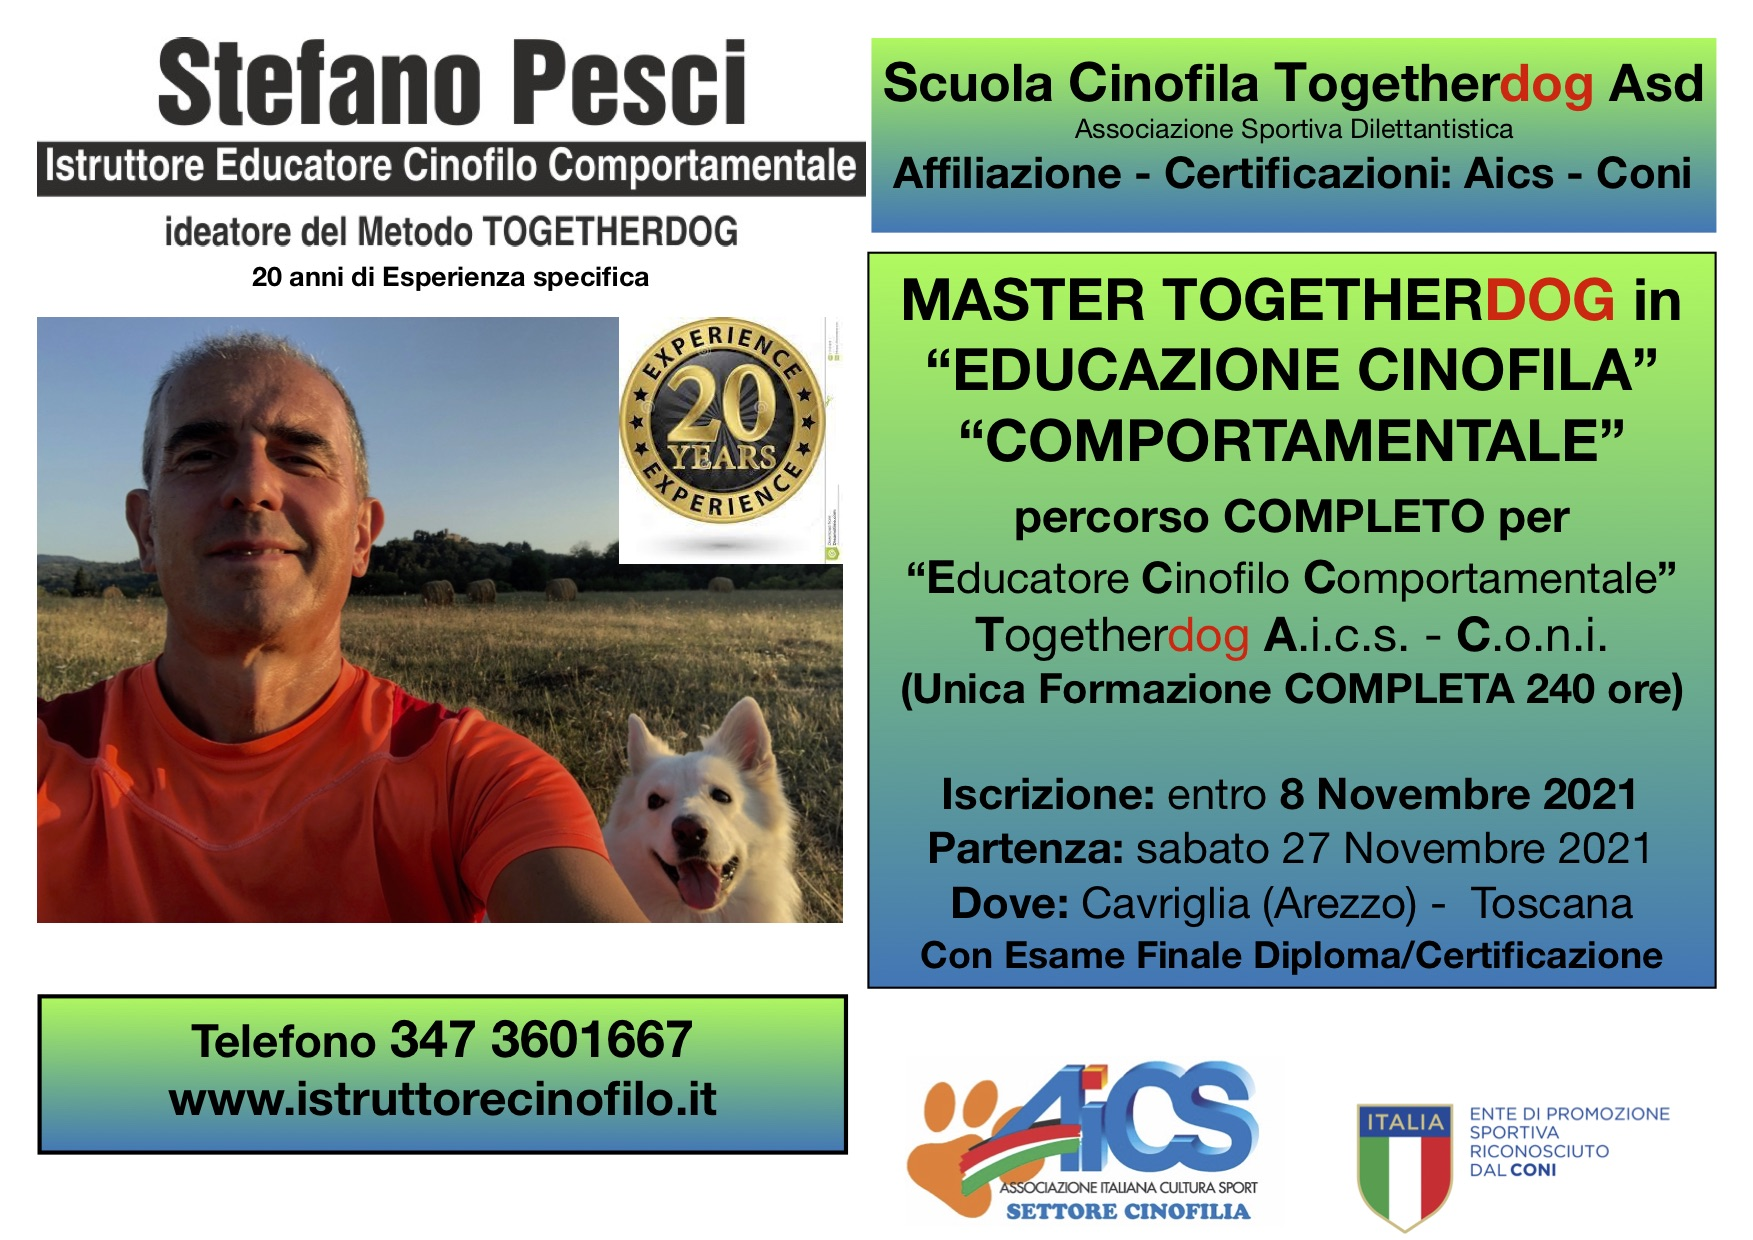 MASTER TGETHERDOG EDUCAZIONE CINOFILA COMPORTAMENTALE PERCORSO EDUCATORE CINOFILO COMPORTAMENTALE